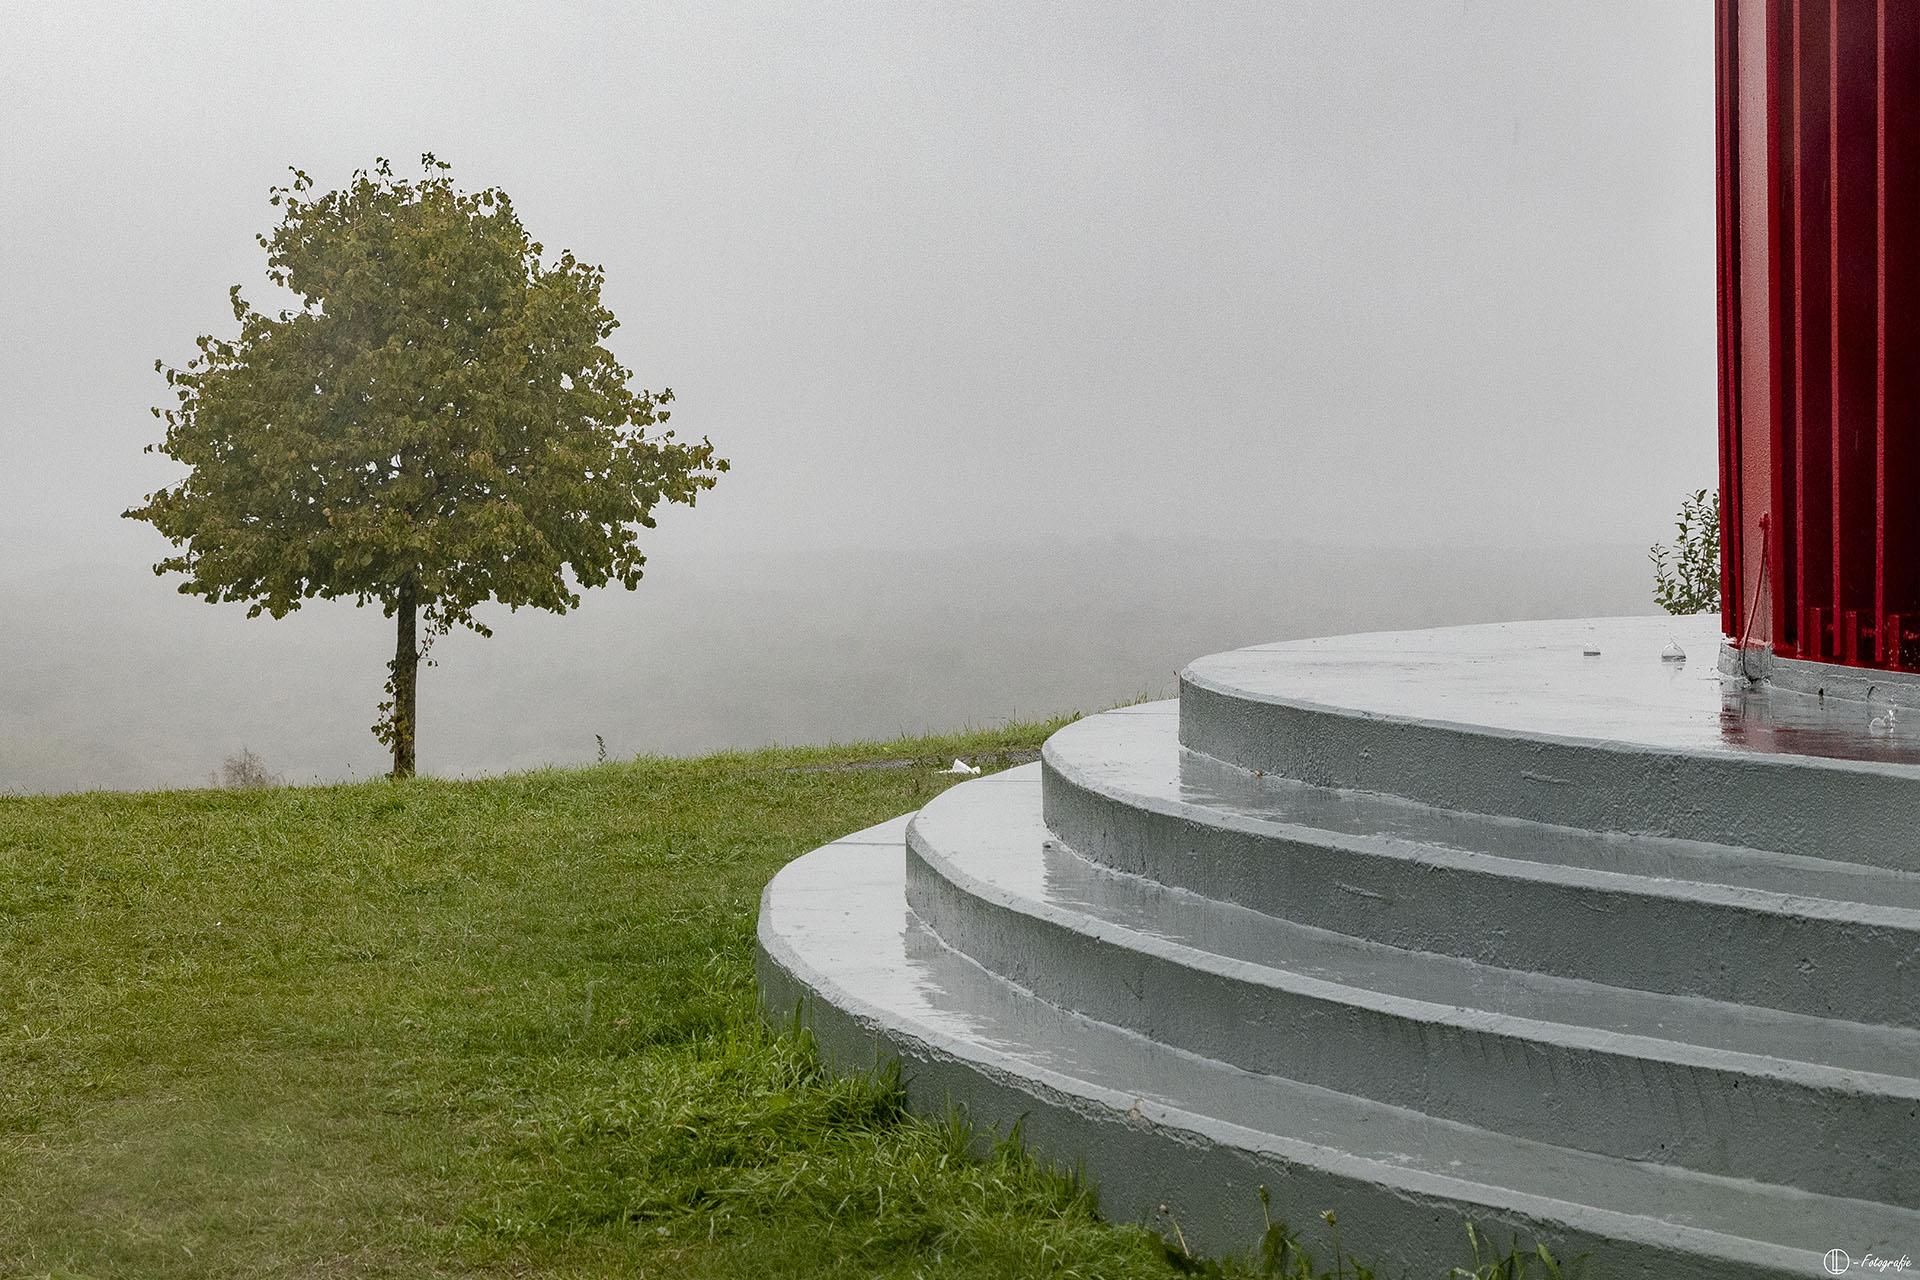 LösungFürVieles, Fotografie, Landschaft, LaPaDu